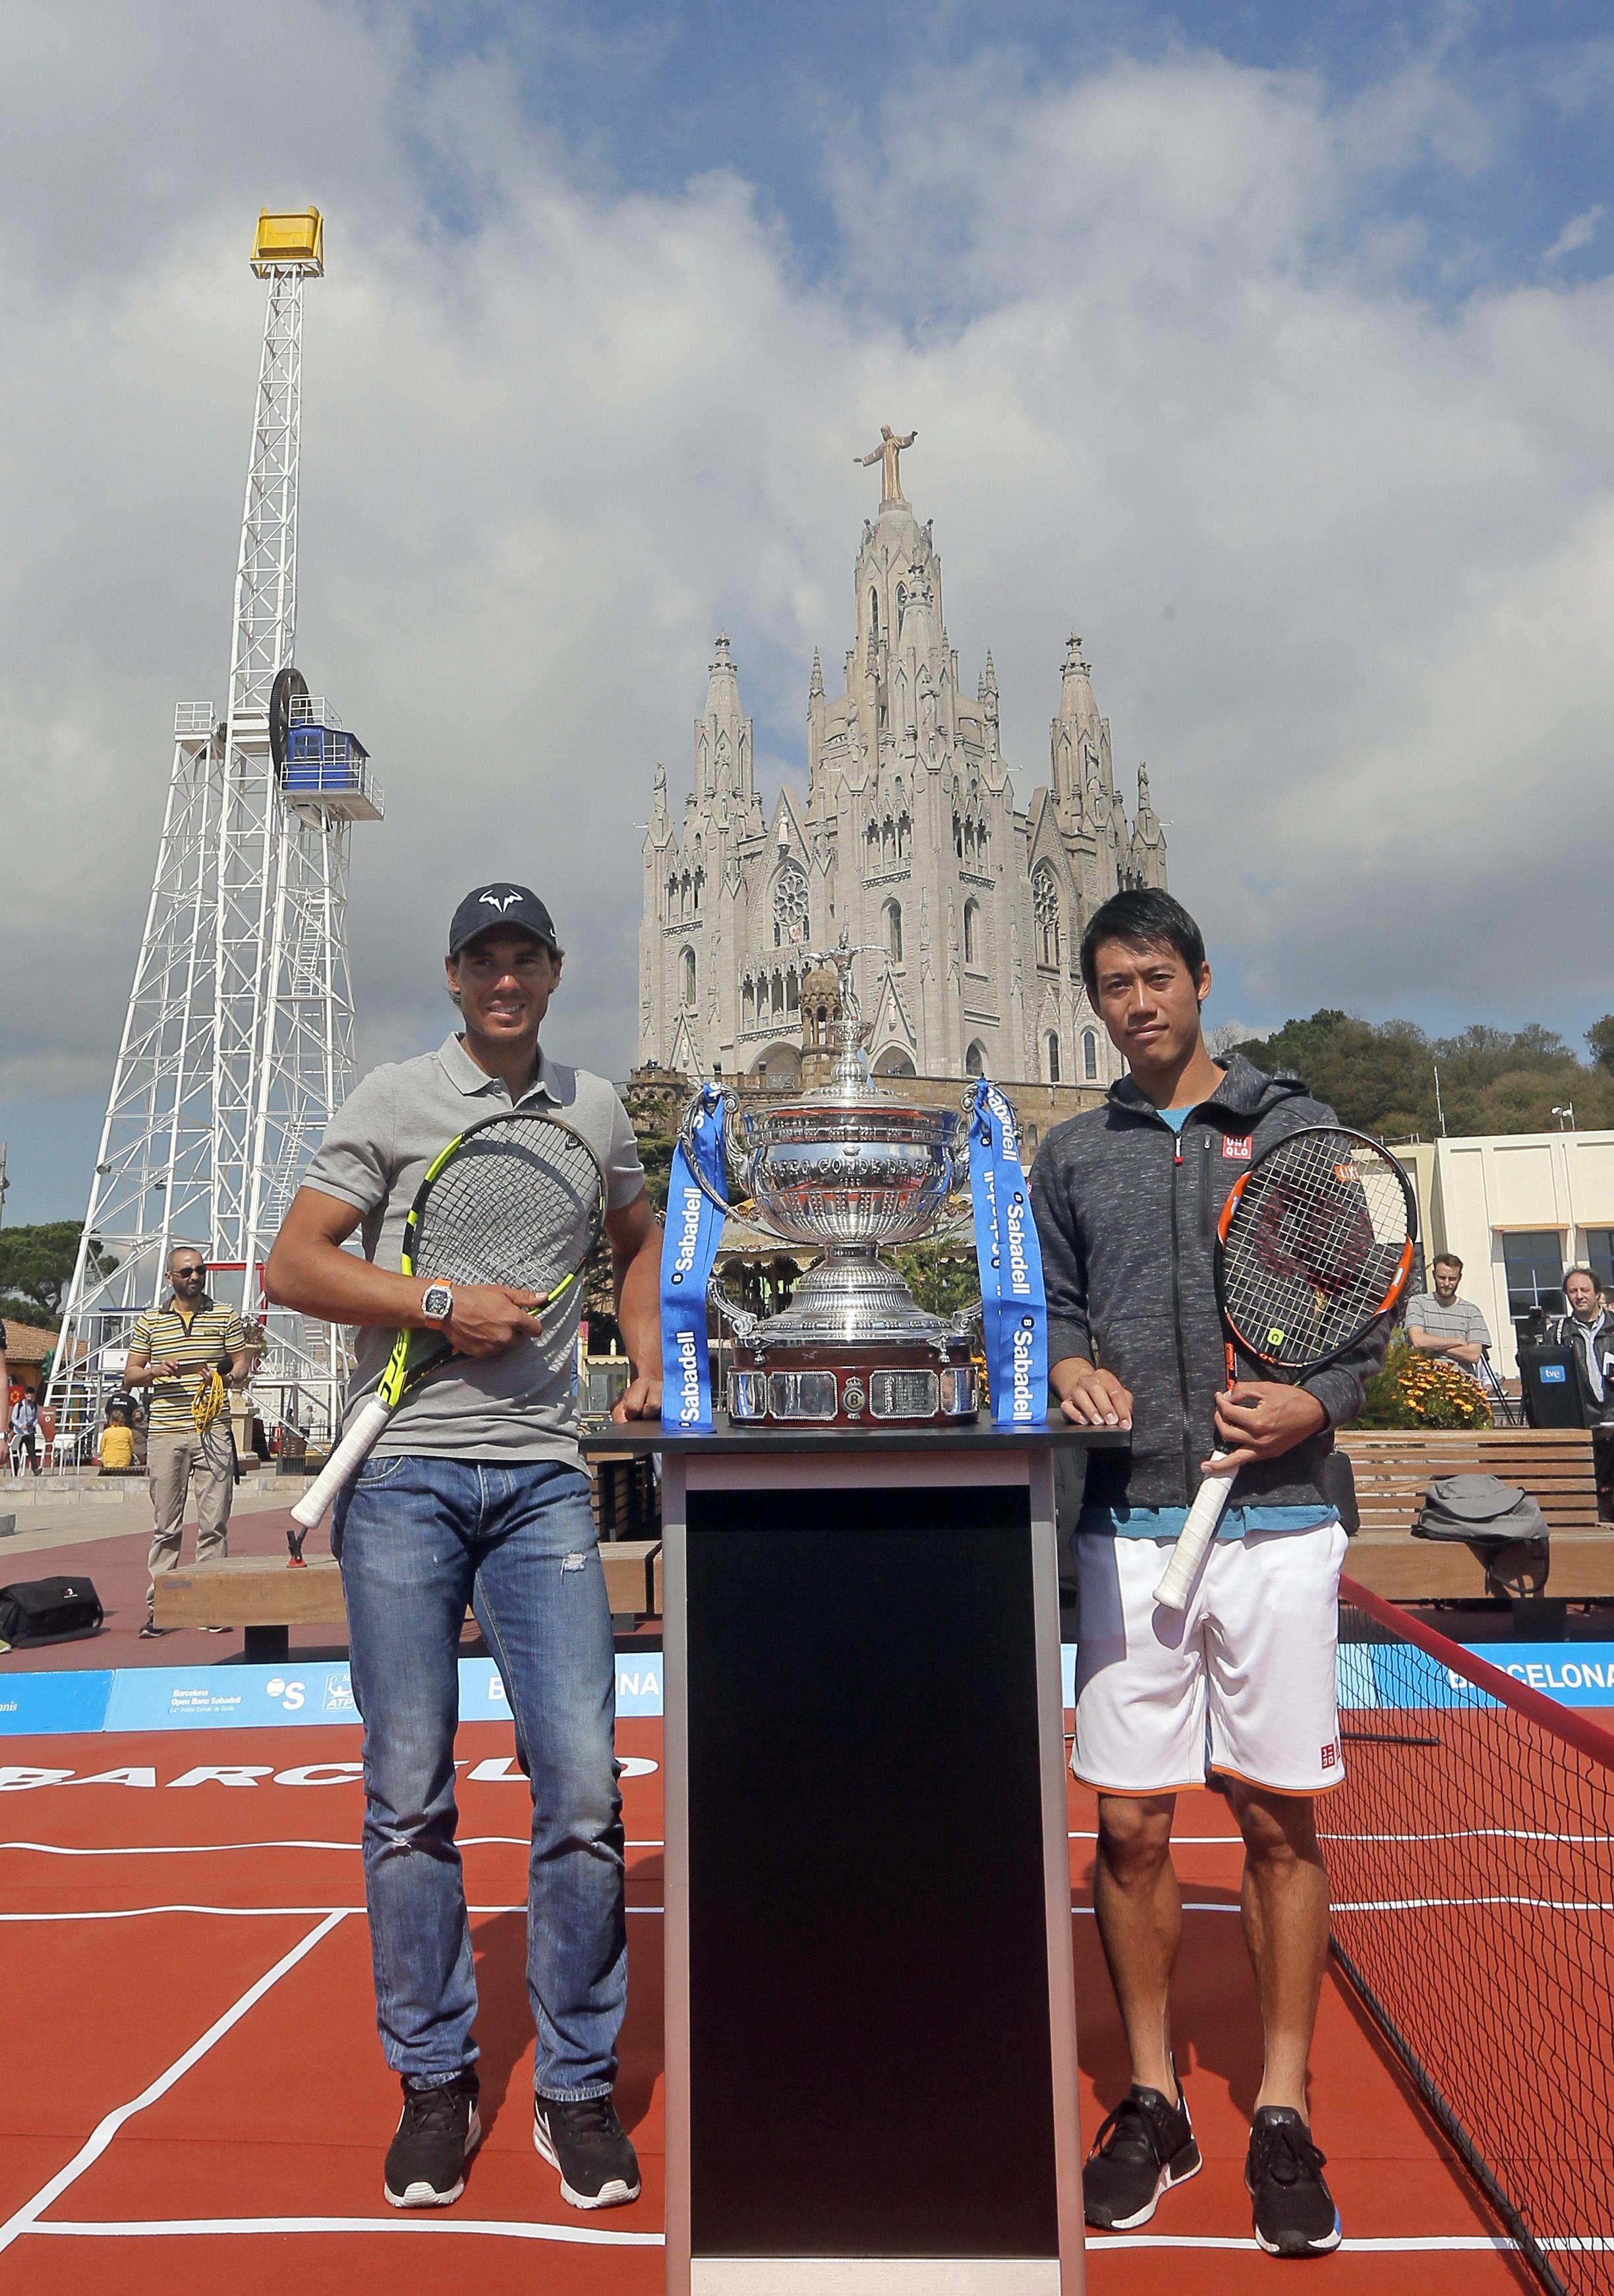 Spain's Rafael Nadal, left, and Kei Nishikori, of Japan pose for the media with the Barcelona Open trophy ahead of the Barcelona Open tennis tournament at the Tibidabo park in Barcelona, Spain, Monday, April 18, 2016. The week-long Barcelona Open tennis t